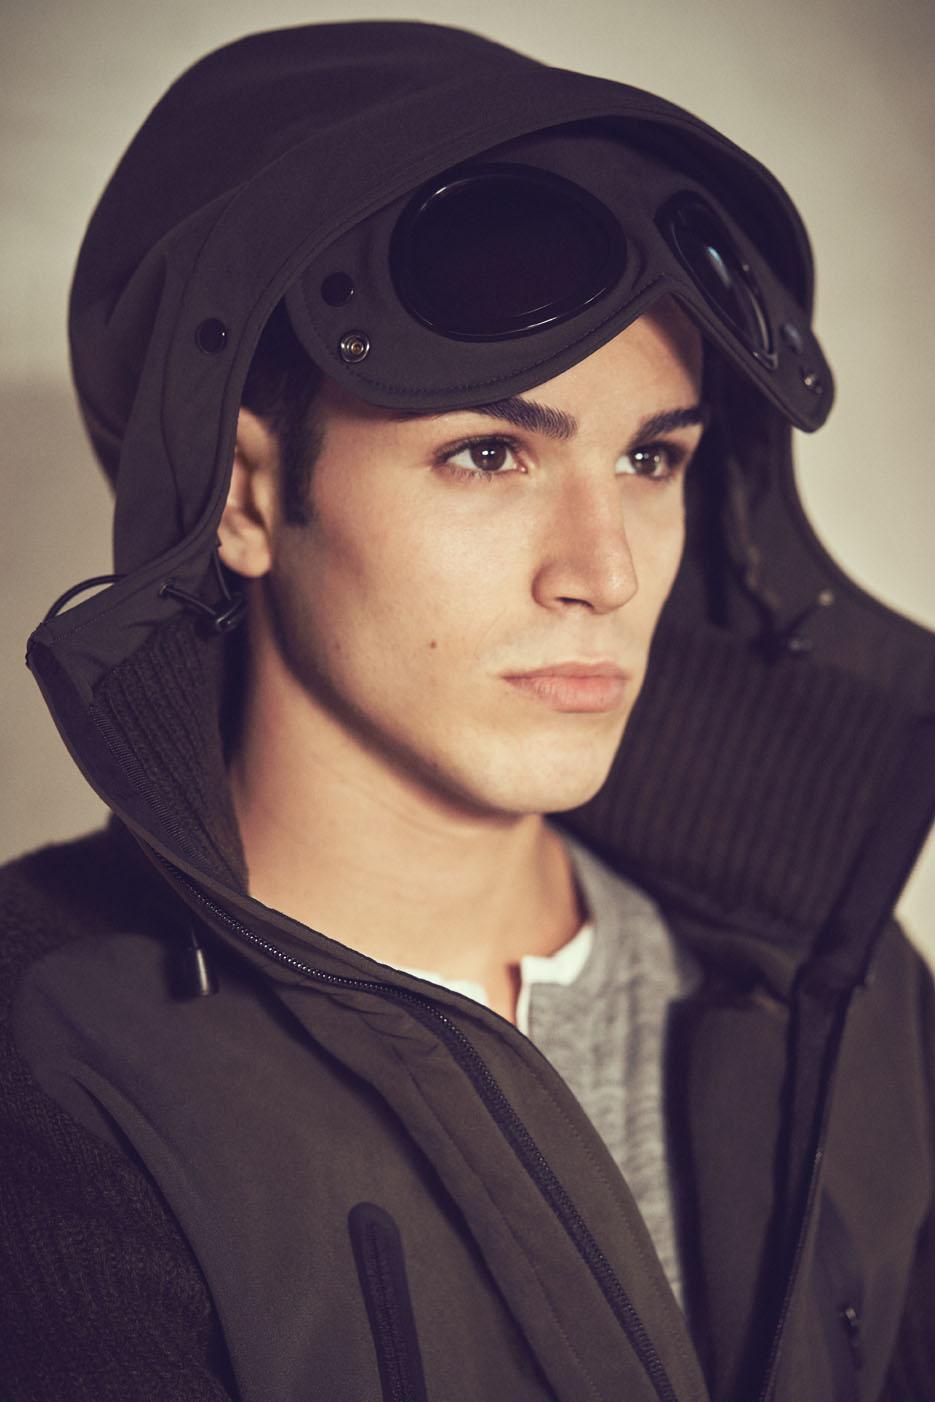 "QG Italia December 2016 ""Nicola Bartolini"" | Tim Clark | GQ Italia | Andrea Tenerani | Numerique Retouch Photo Retouching Studio"